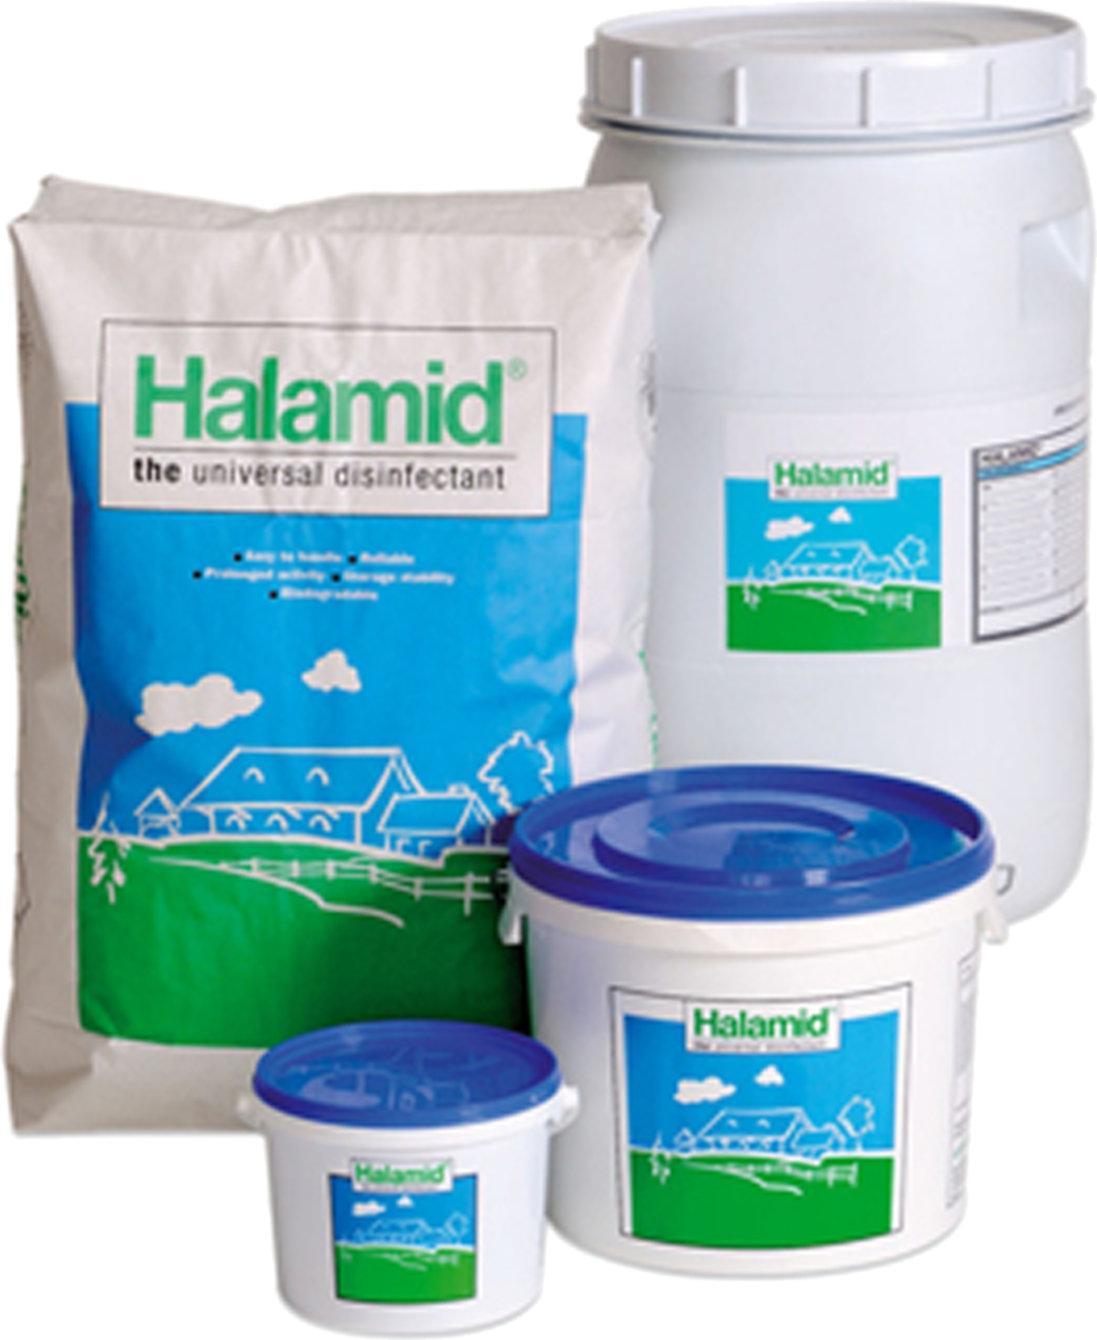 chloramine t halamid contre bact ries virus champignons dans le bassin ko 3kg ebay. Black Bedroom Furniture Sets. Home Design Ideas